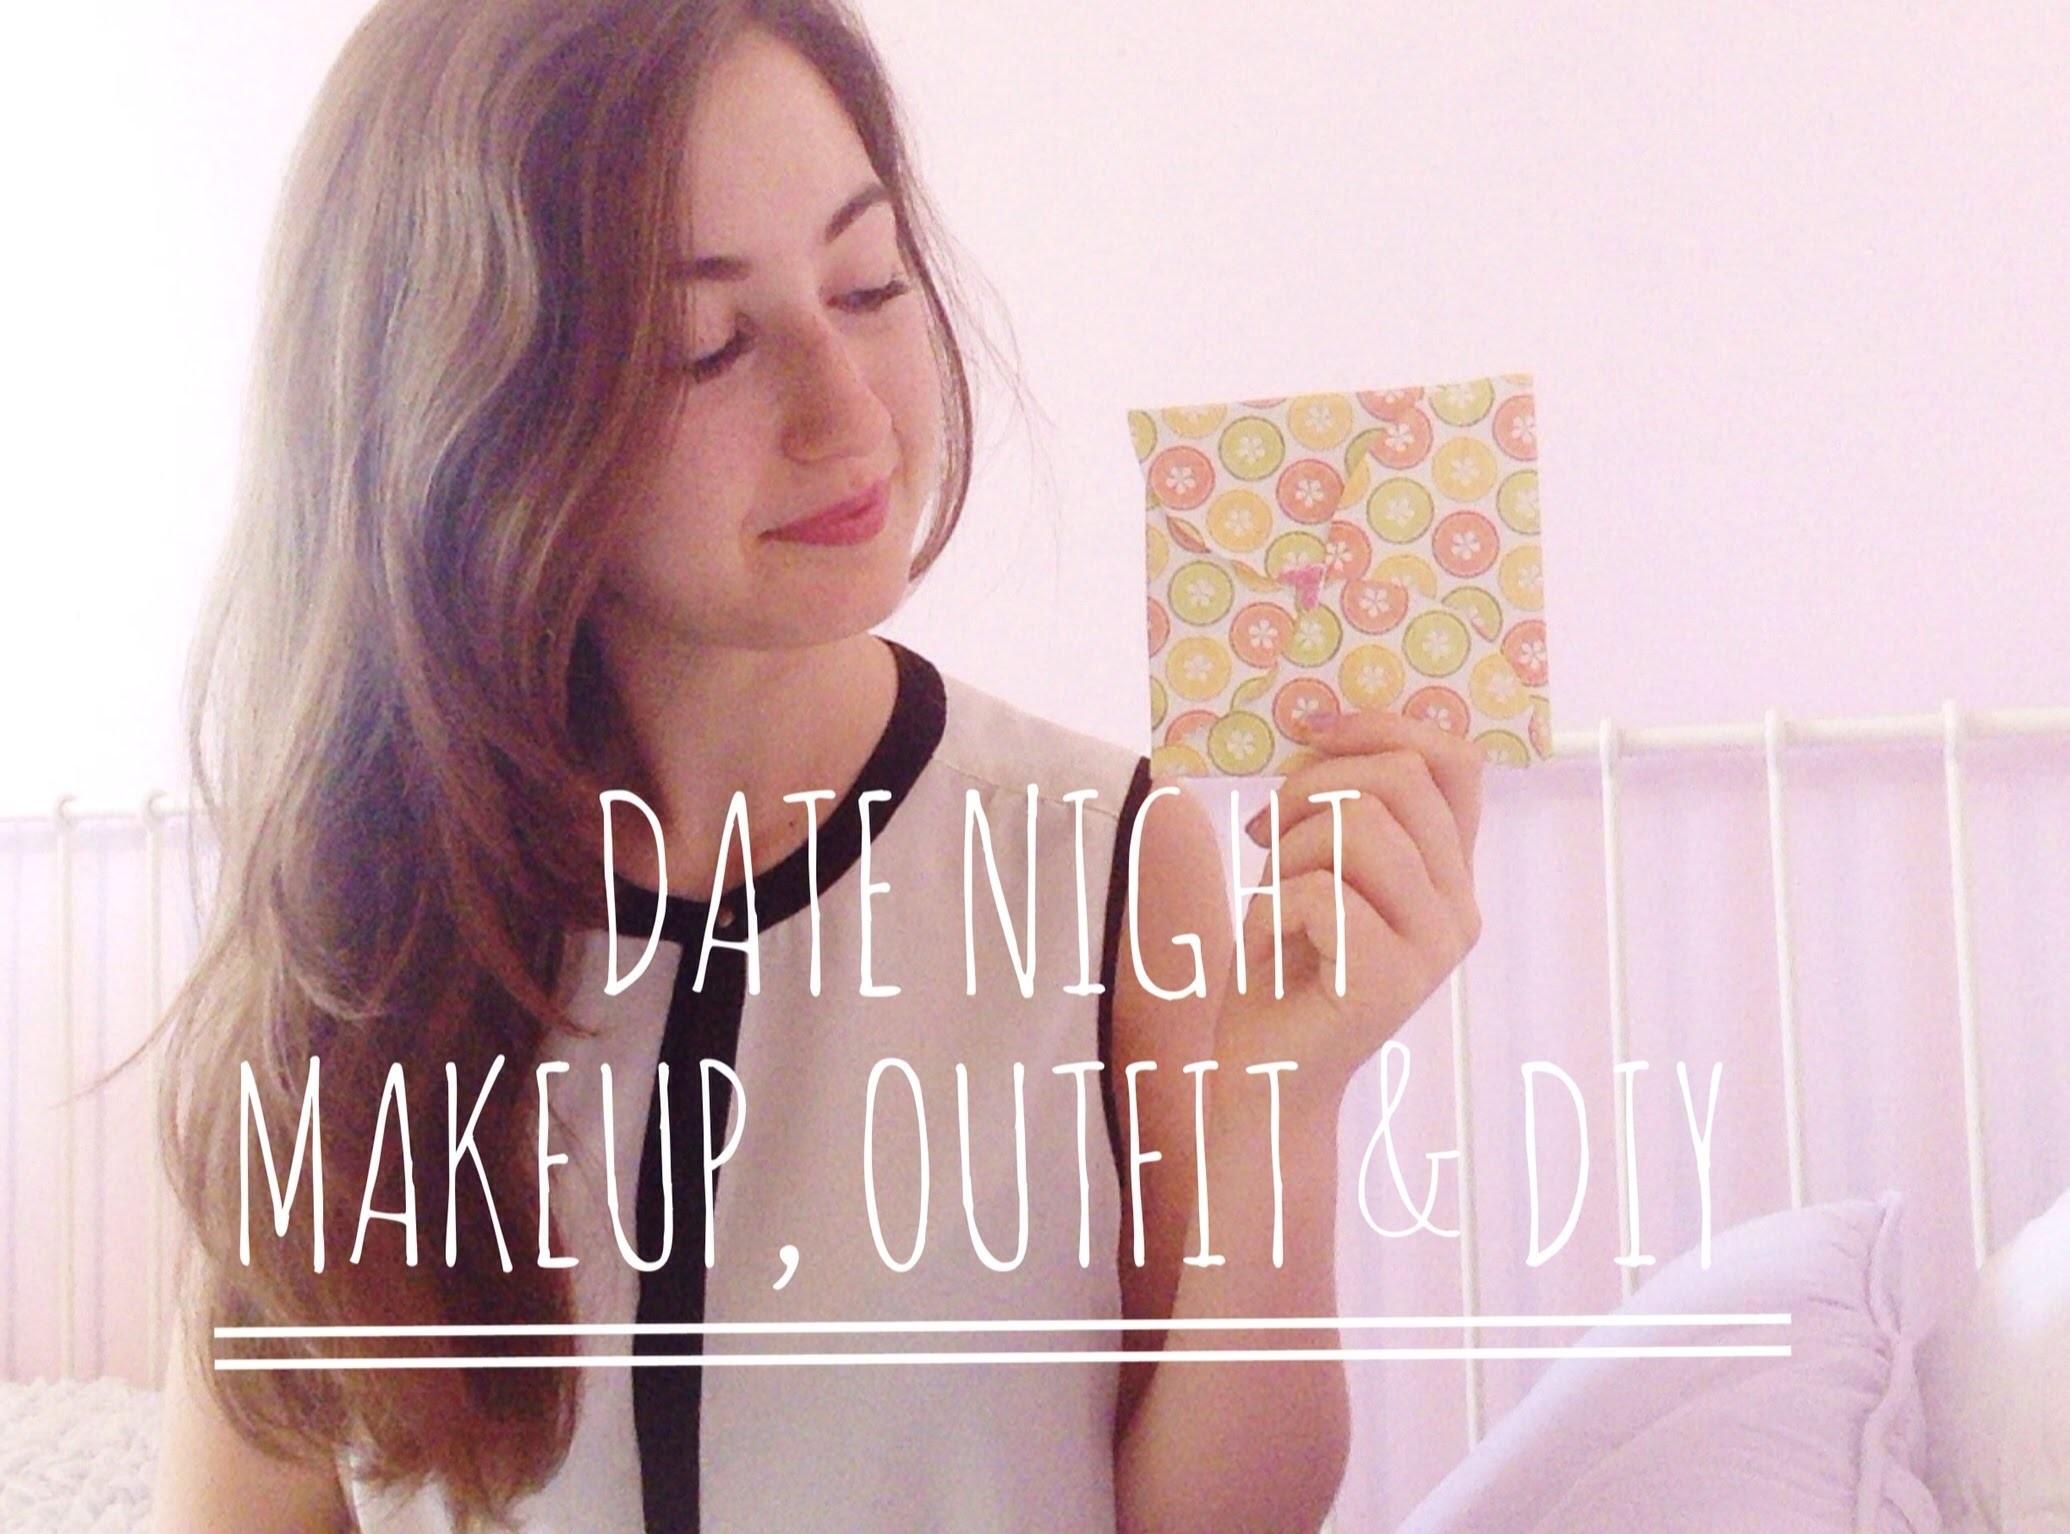 Romantic Date Night Makeup, Outfit & DIY♡ | itsLucretia